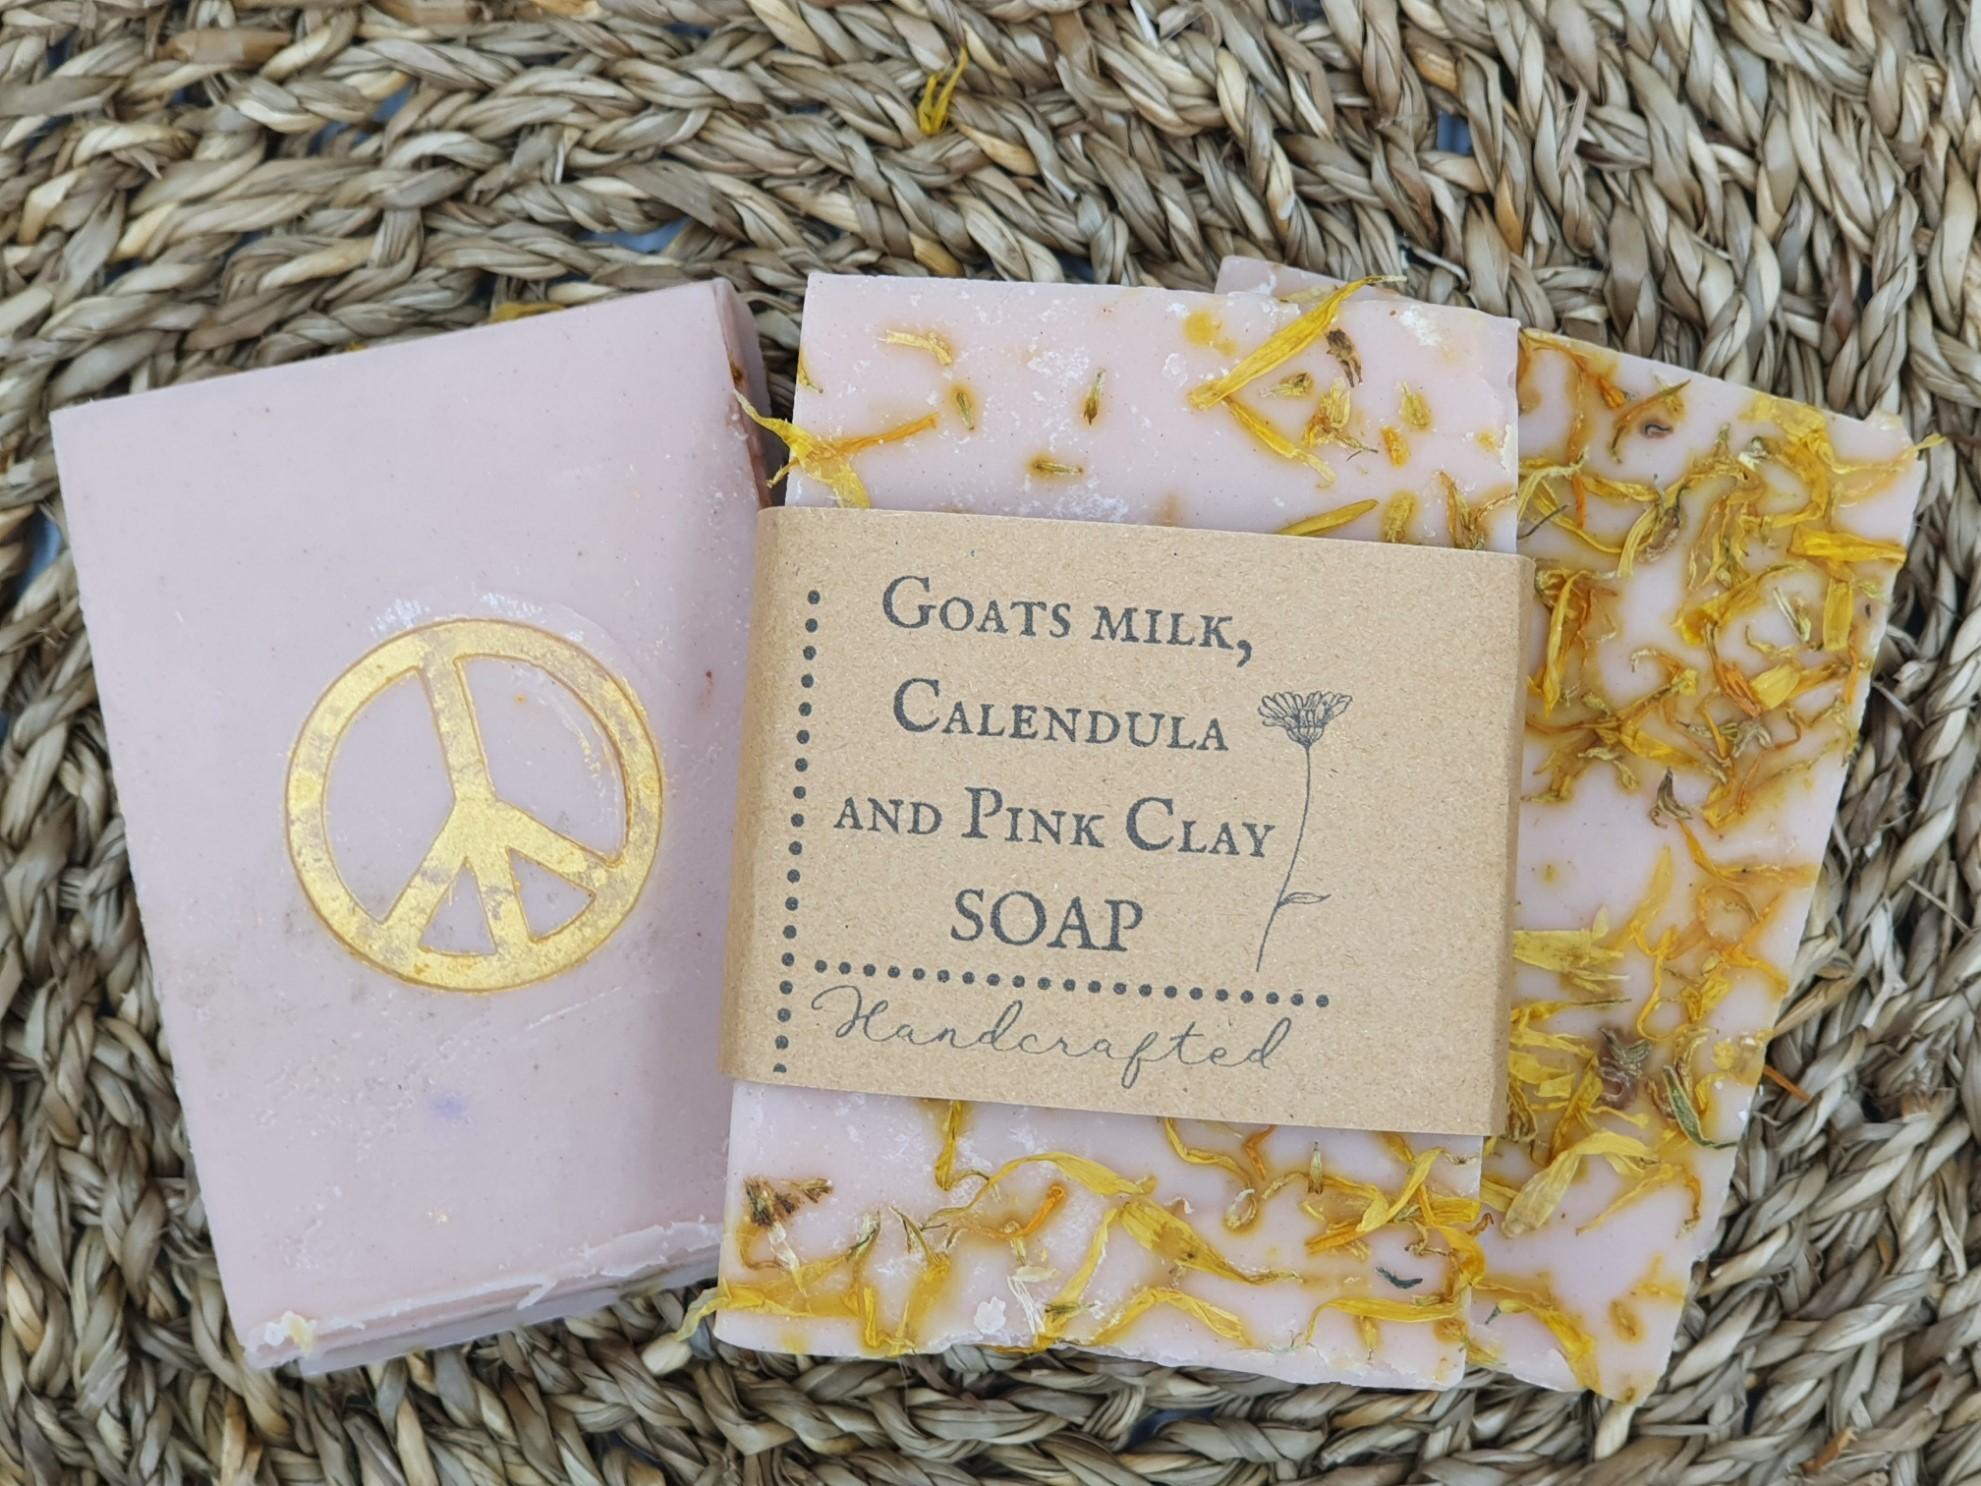 Goats milk, Calendula and Pink clay soap